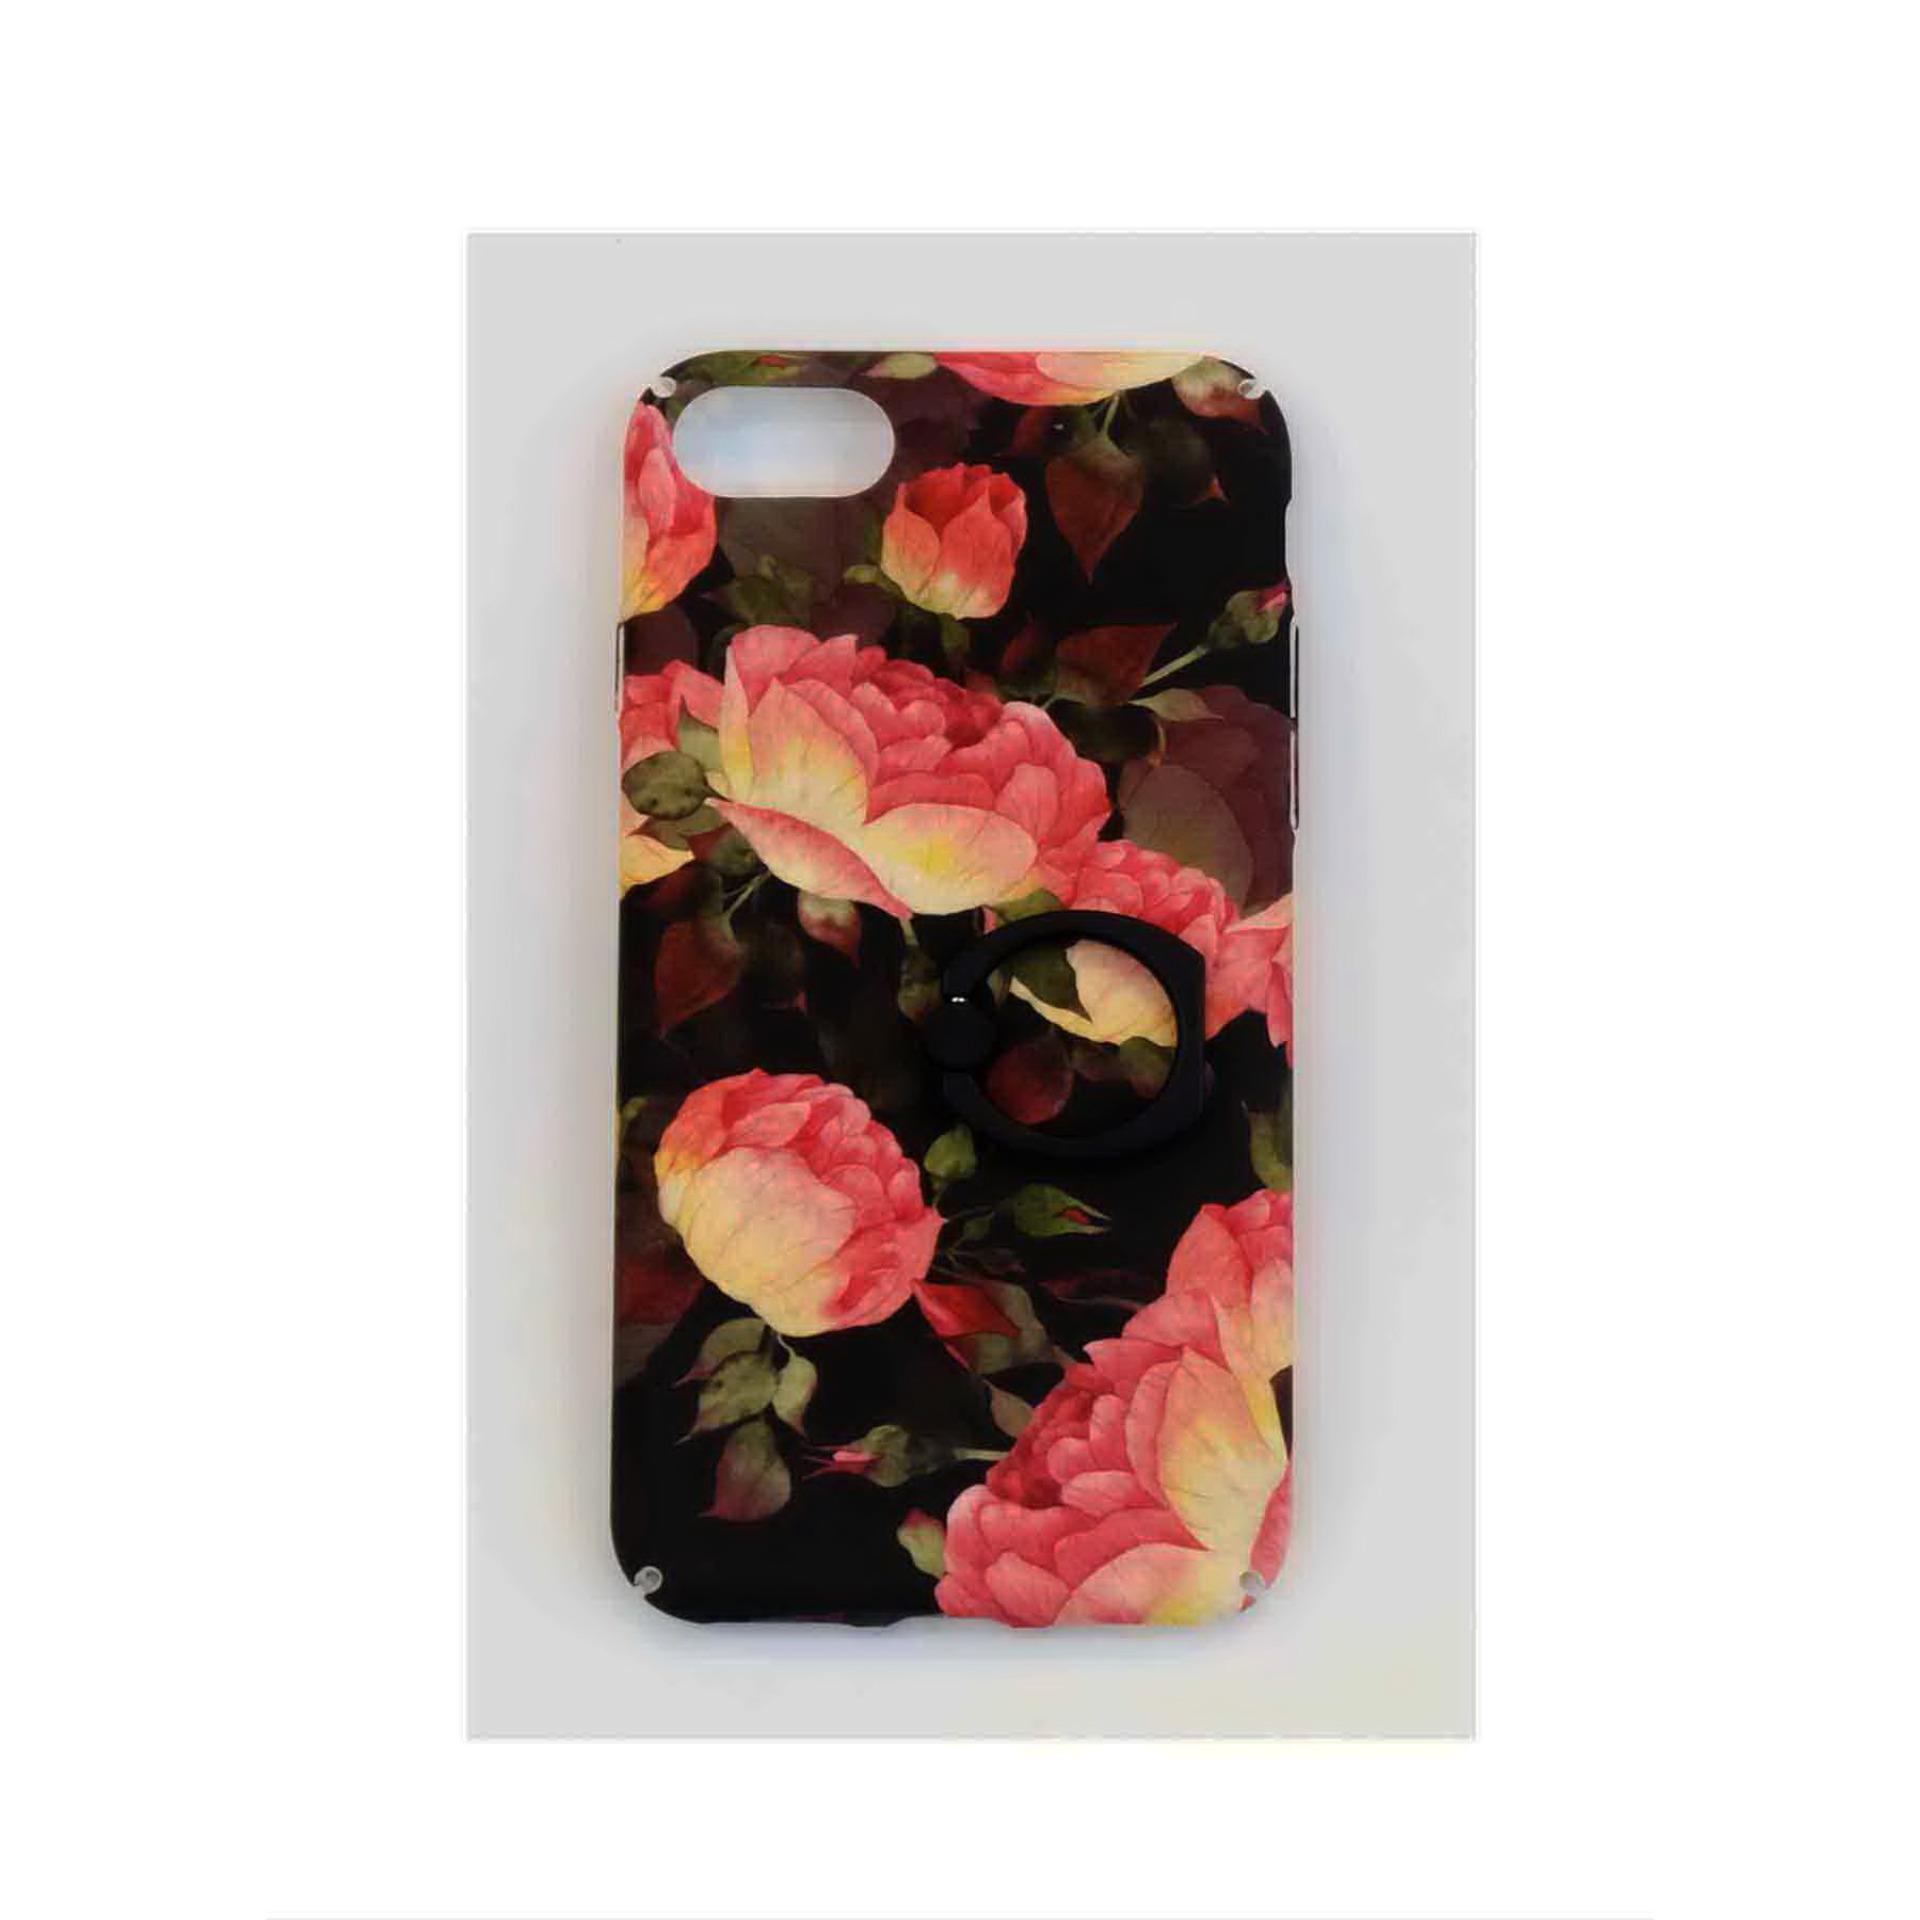 Unduh 820 Koleksi Wallpaper Bunga Iphone 7 Paling Keren